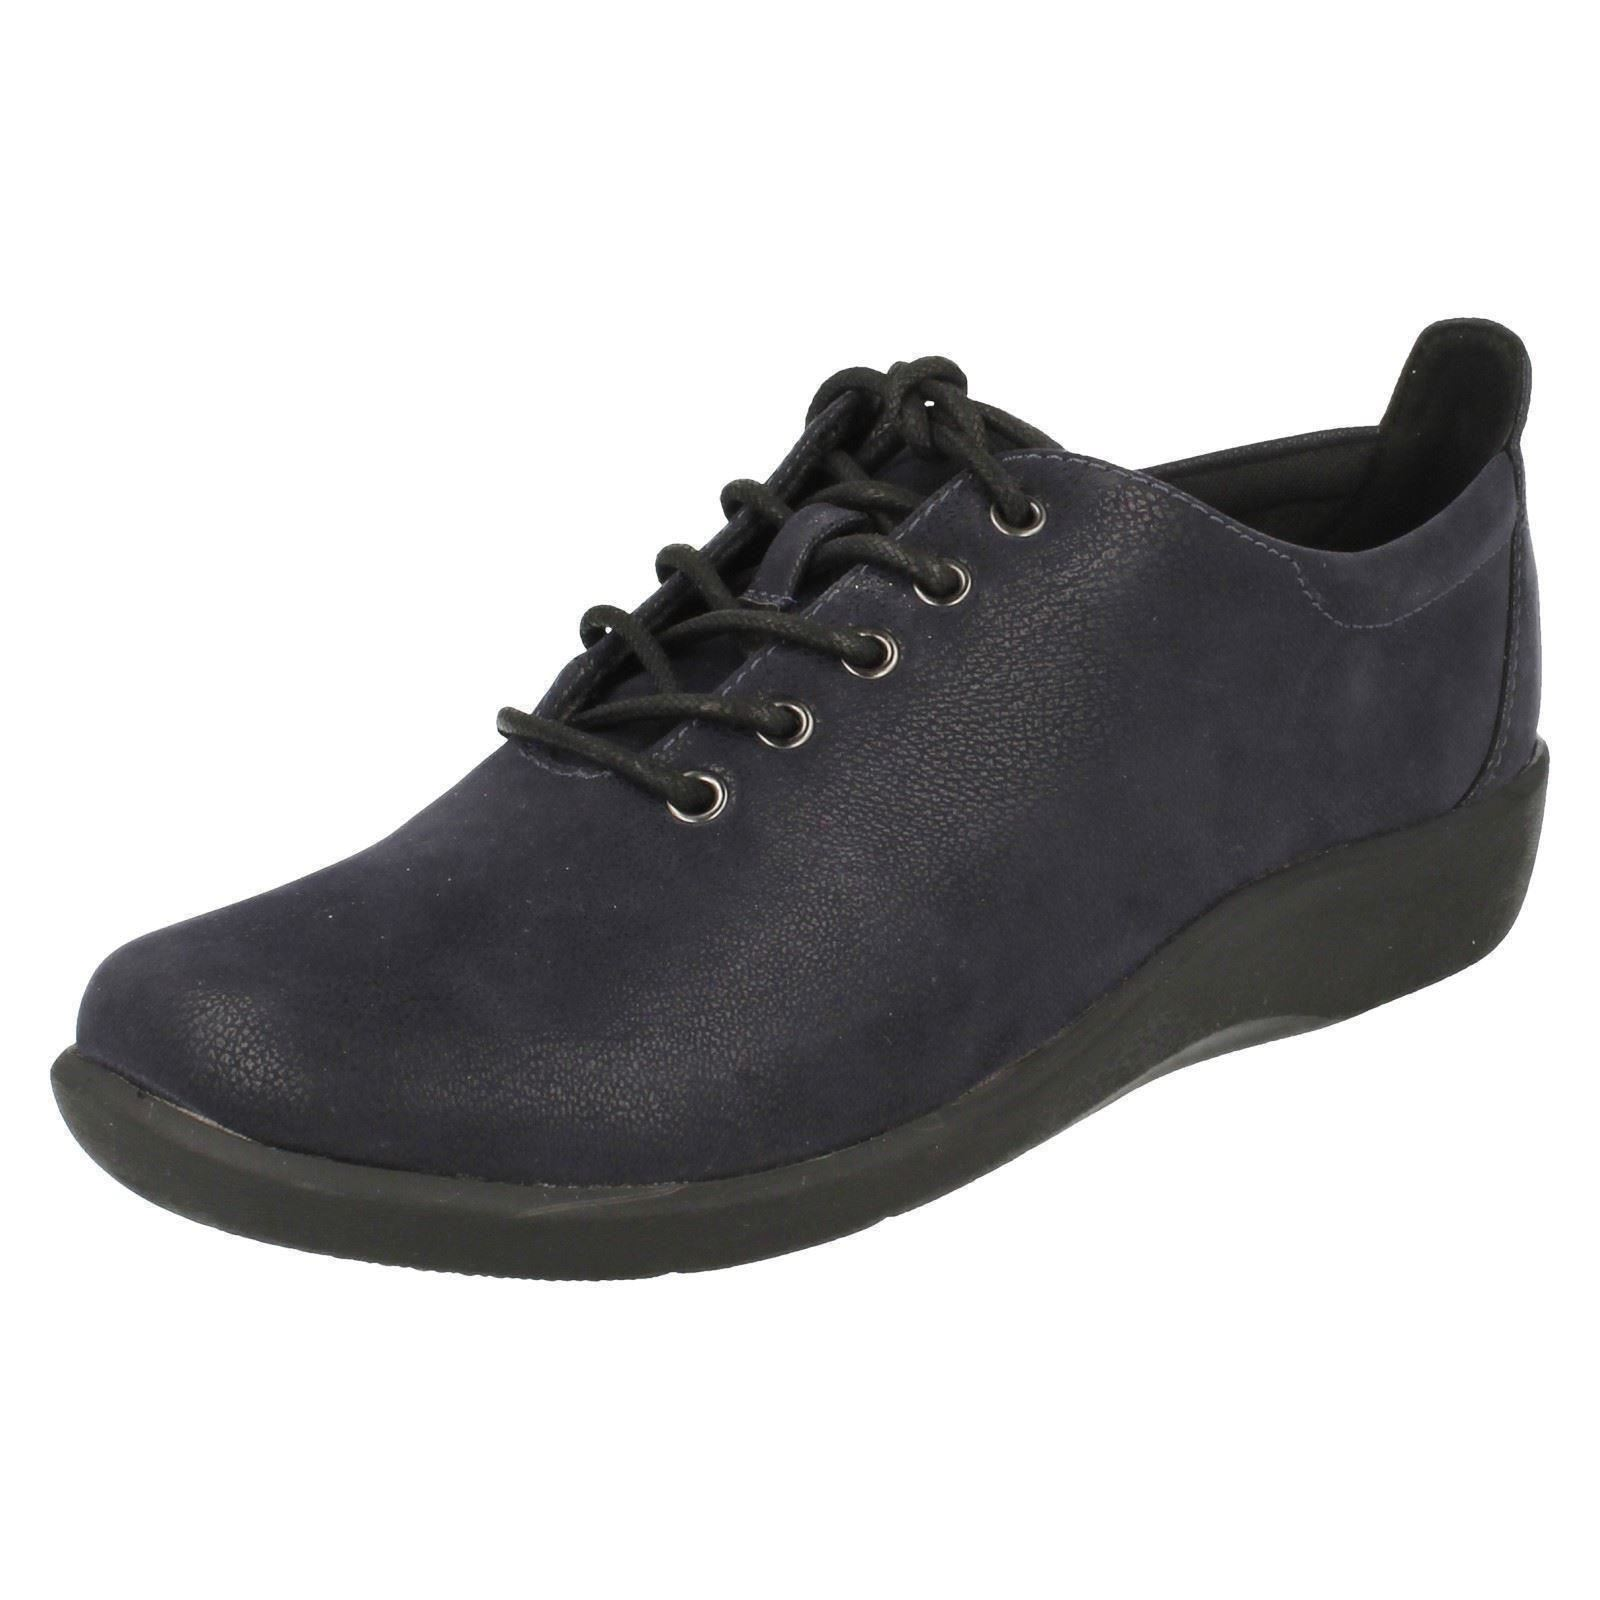 Clark S Sillian Bella Shoes